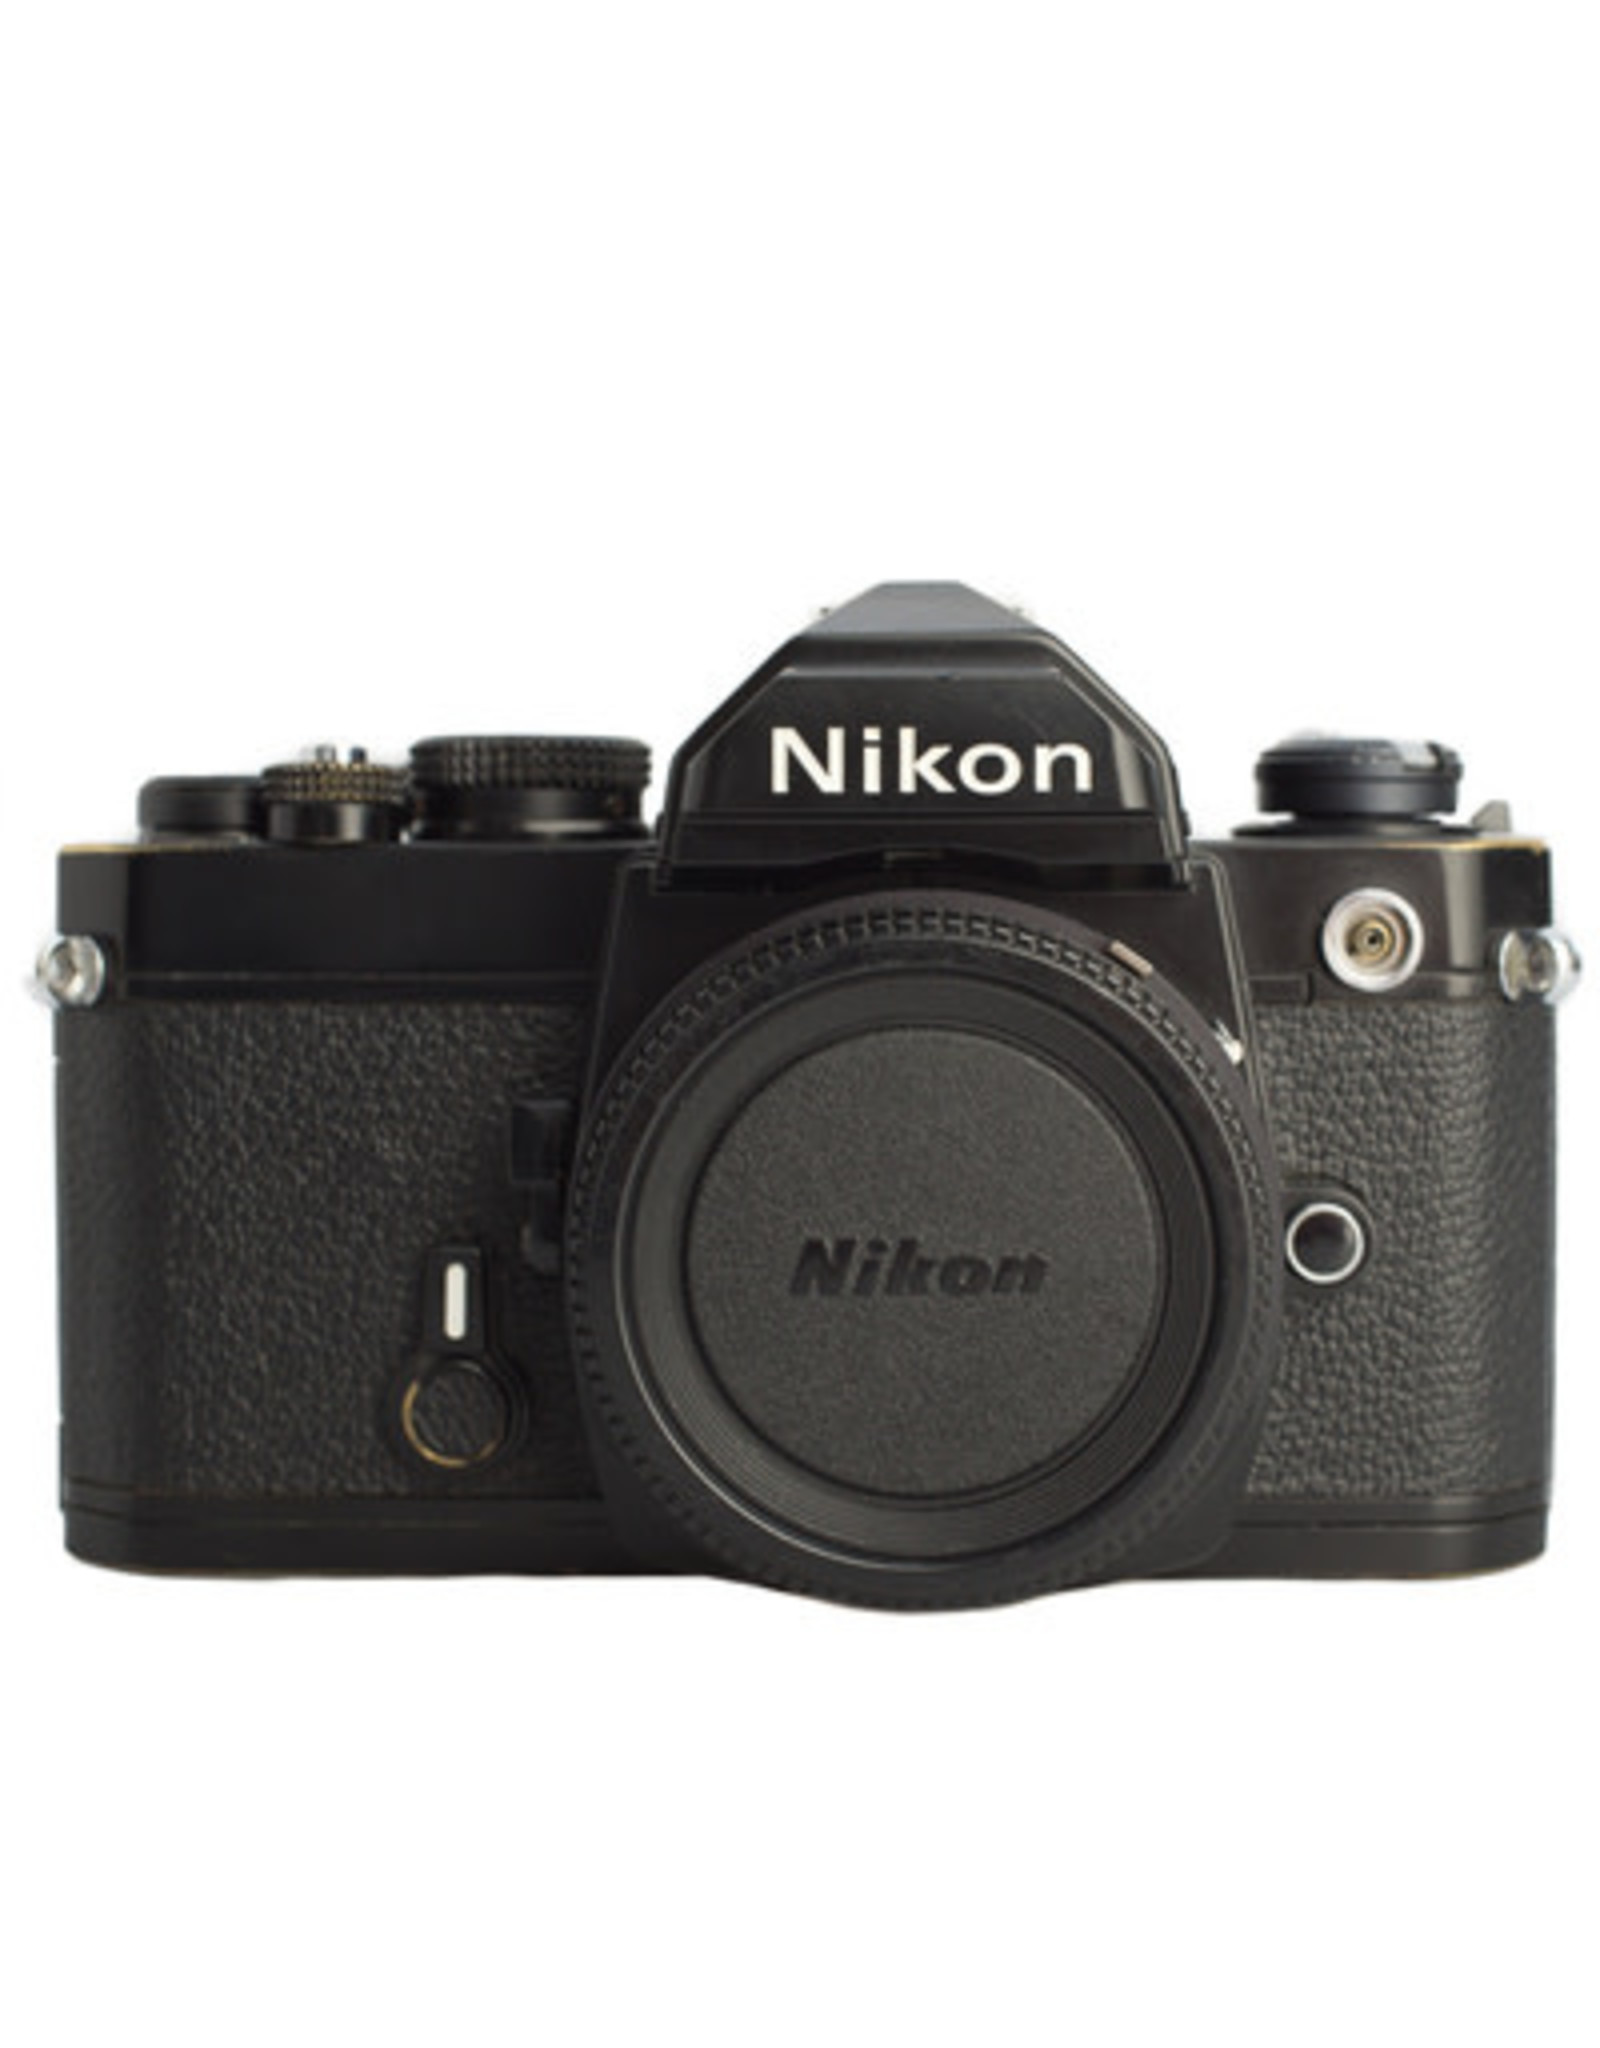 Nikon Nikon FM 35mm Film SLR Camera